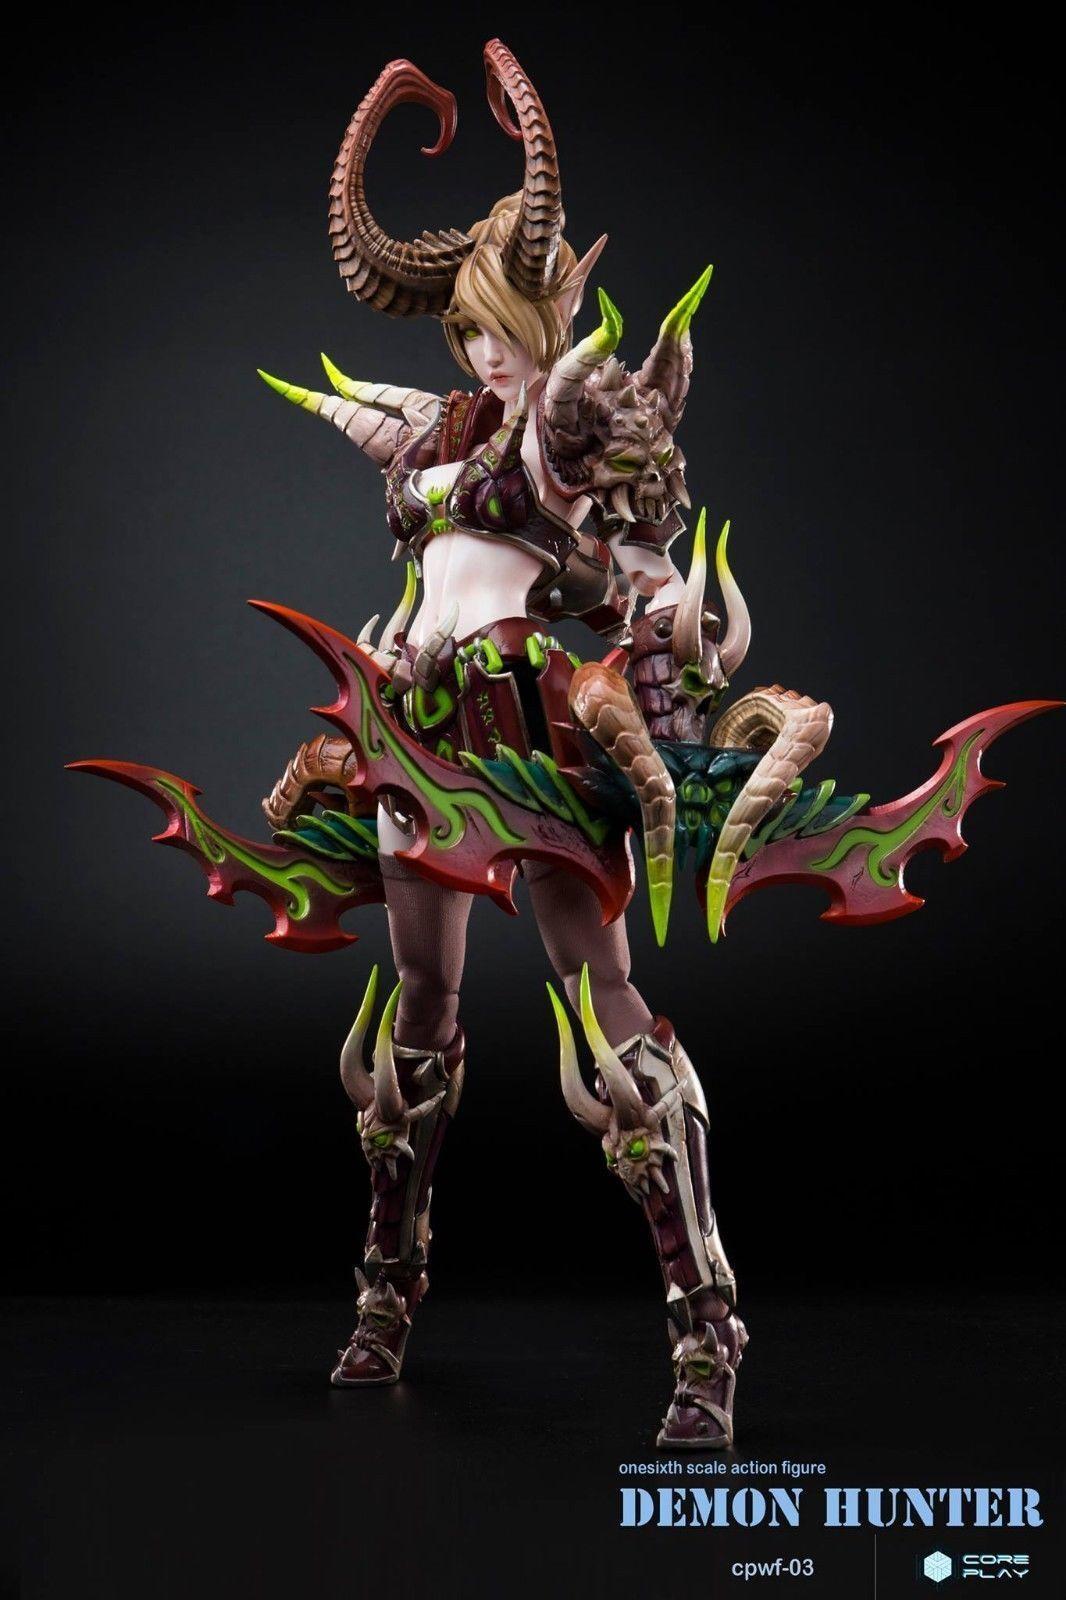 1 6 Scale Anime Coreplay Coreplay Coreplay Demon Hunter Female Action Figure Box Set CPWF-03 658beb